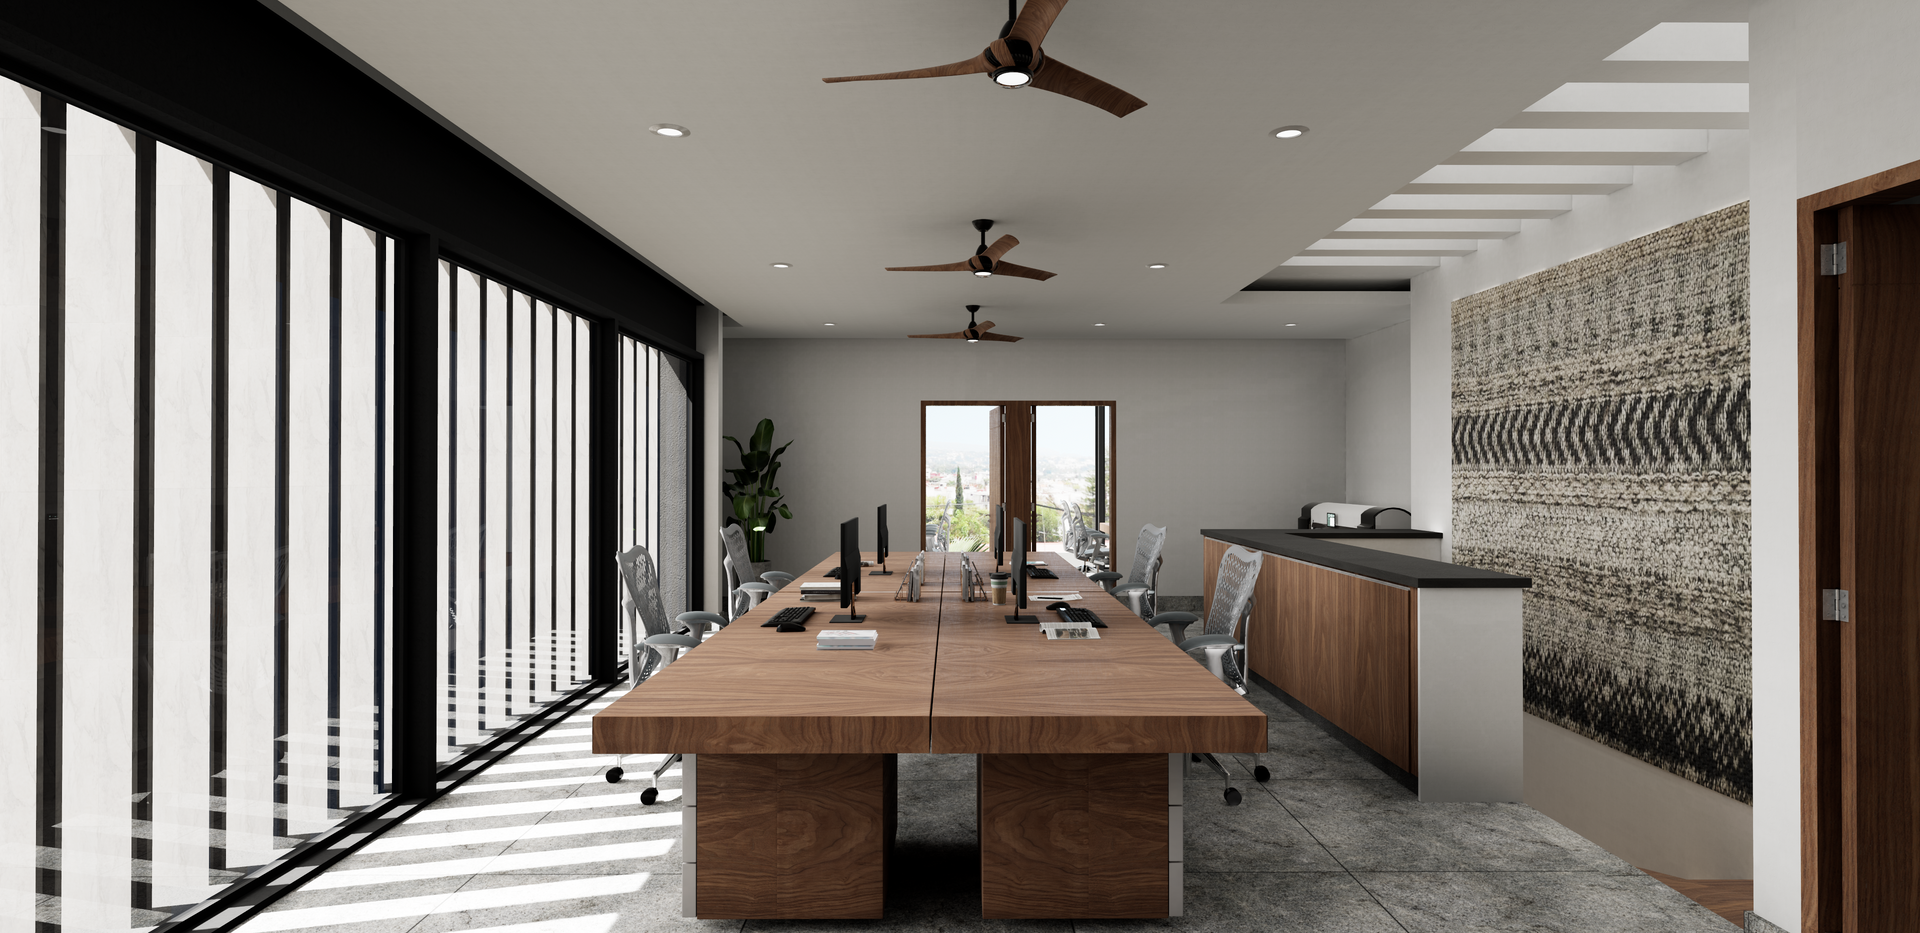 UR-DM Arquitectos Oficinas-Render 13.png